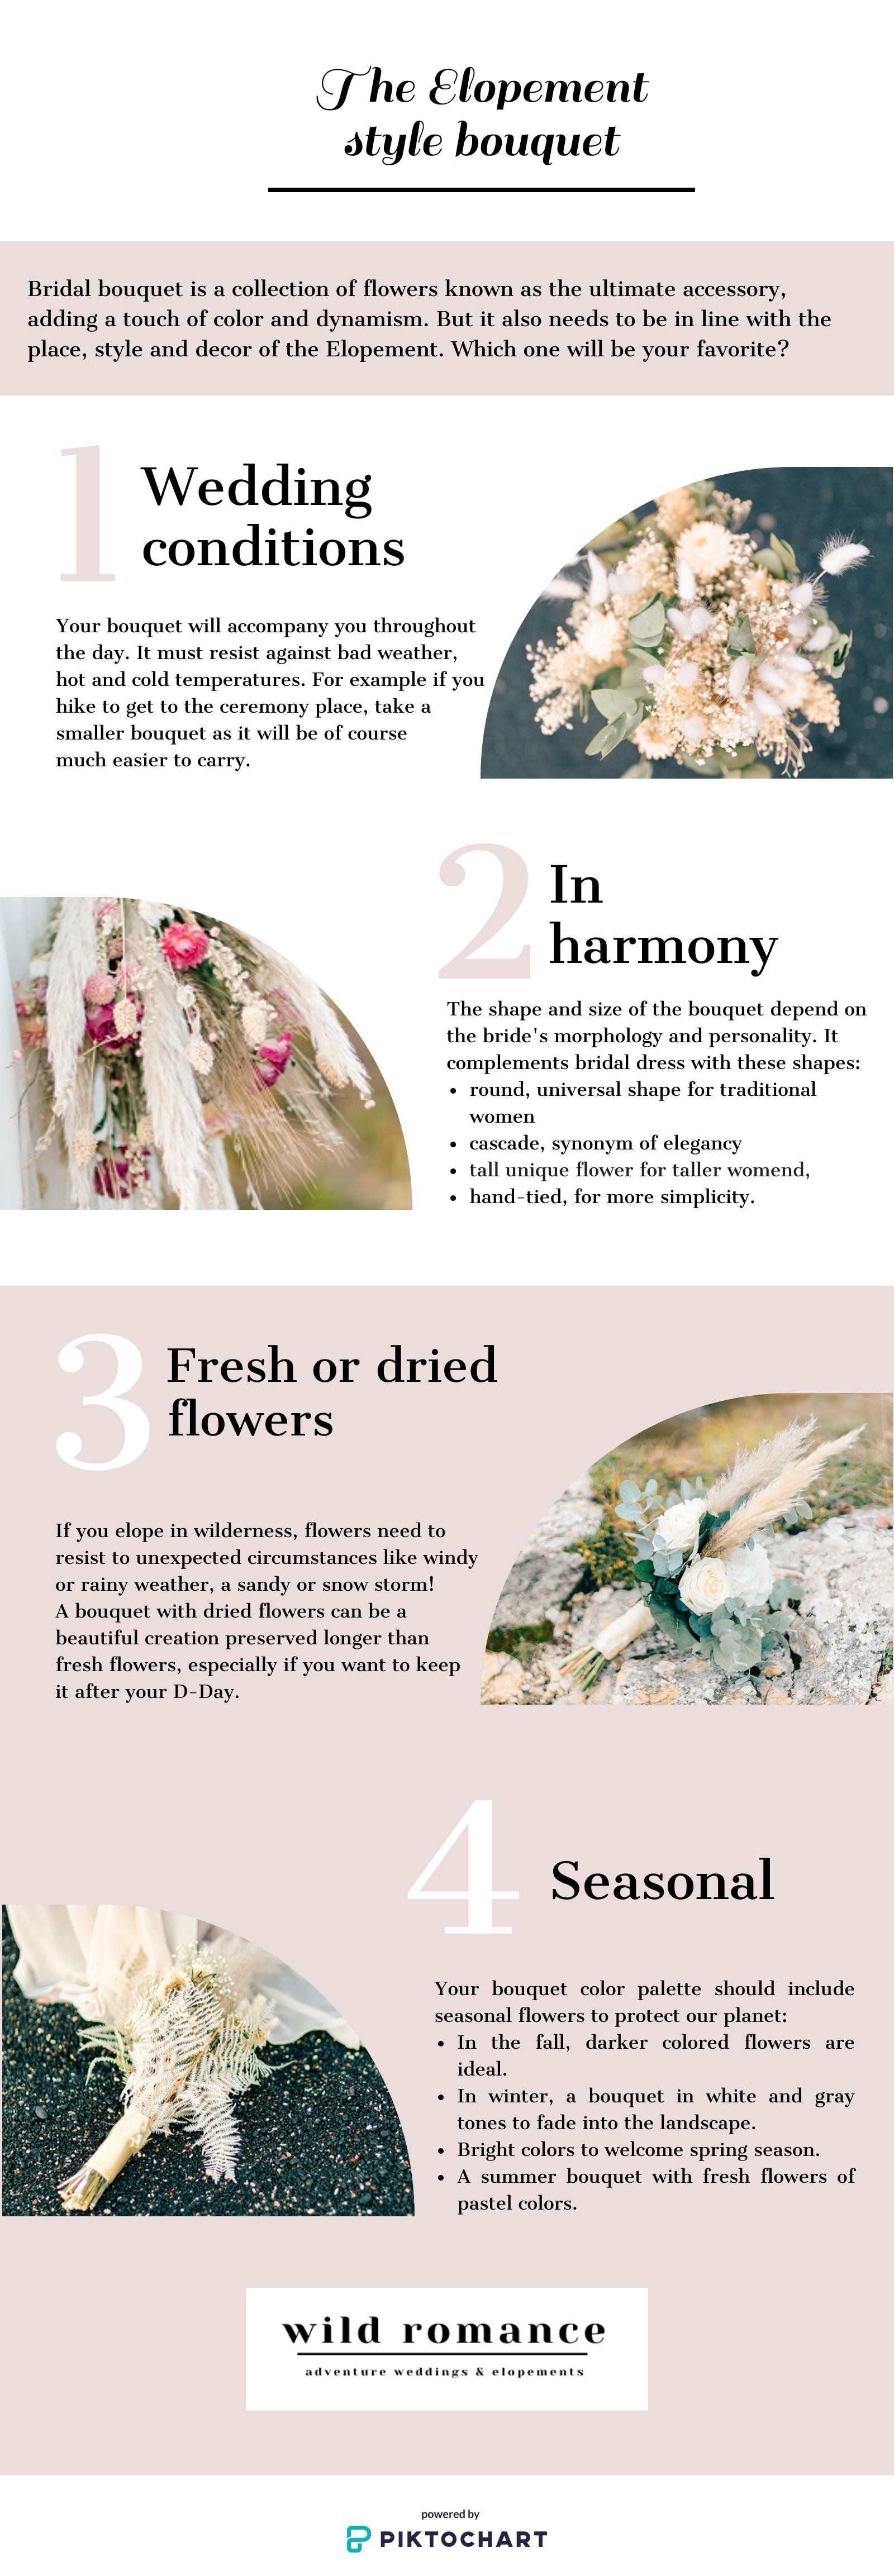 elopement-bouquet-wild-romance